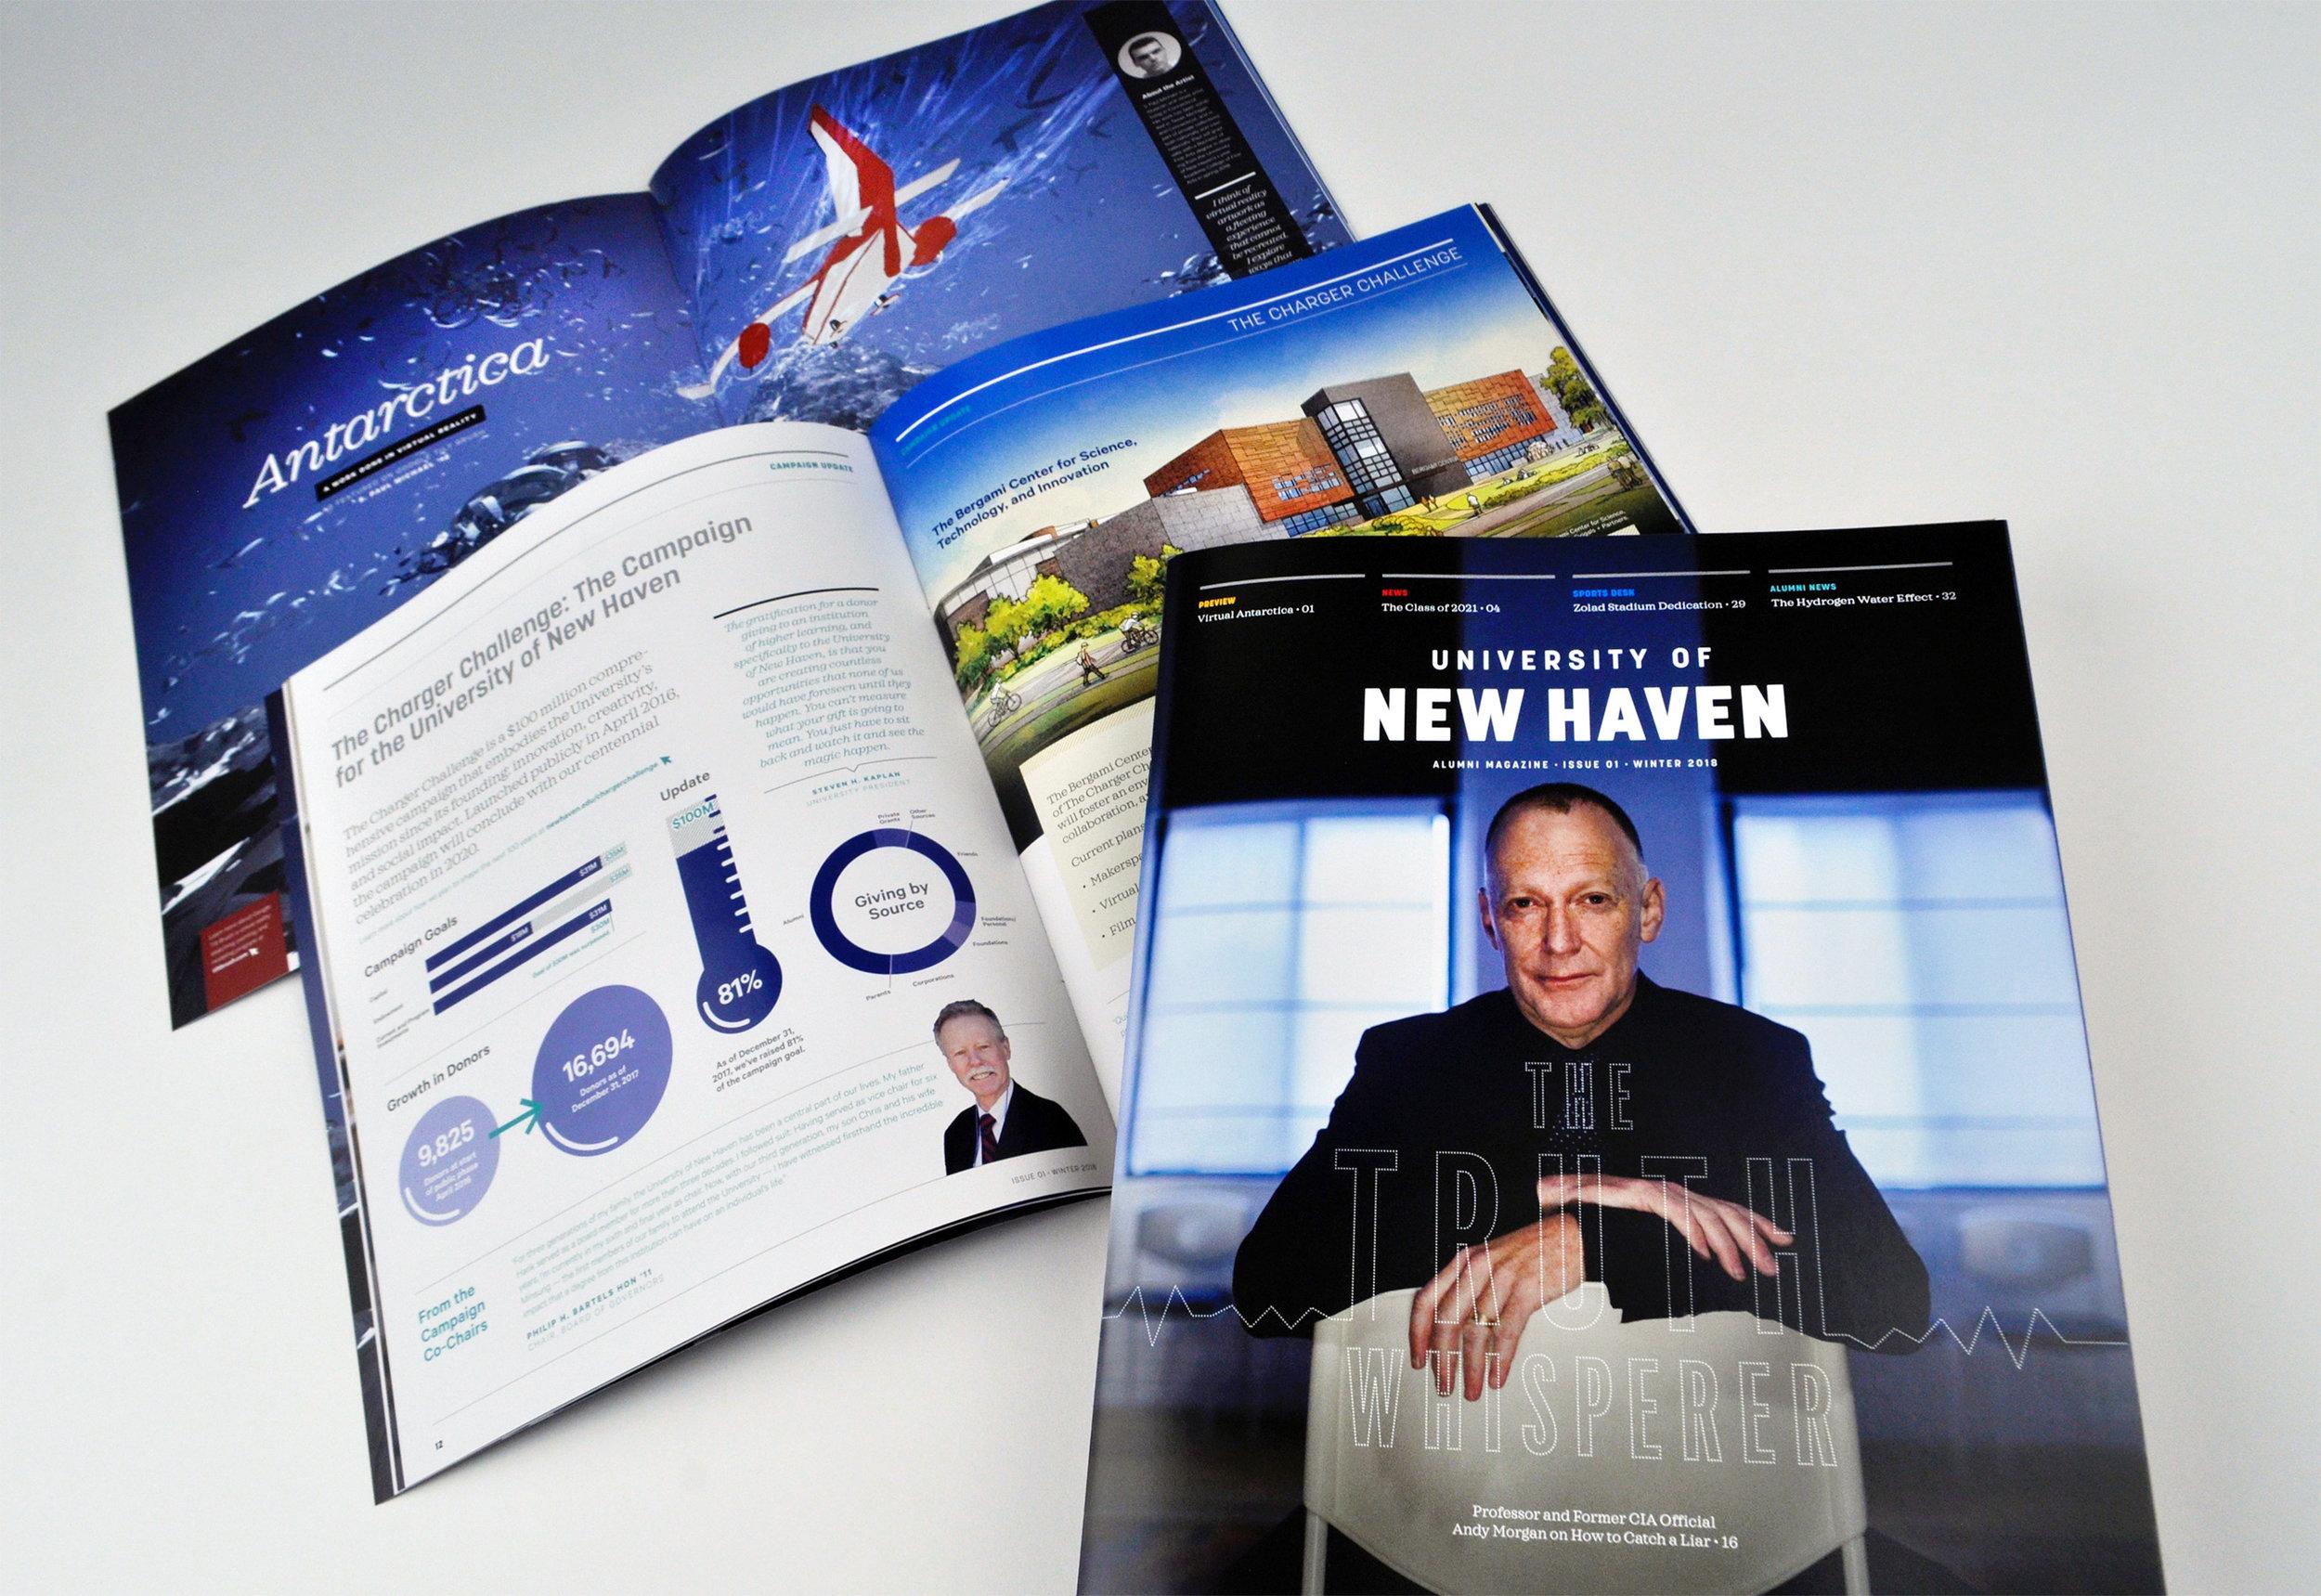 University of New Haven alumni magazine